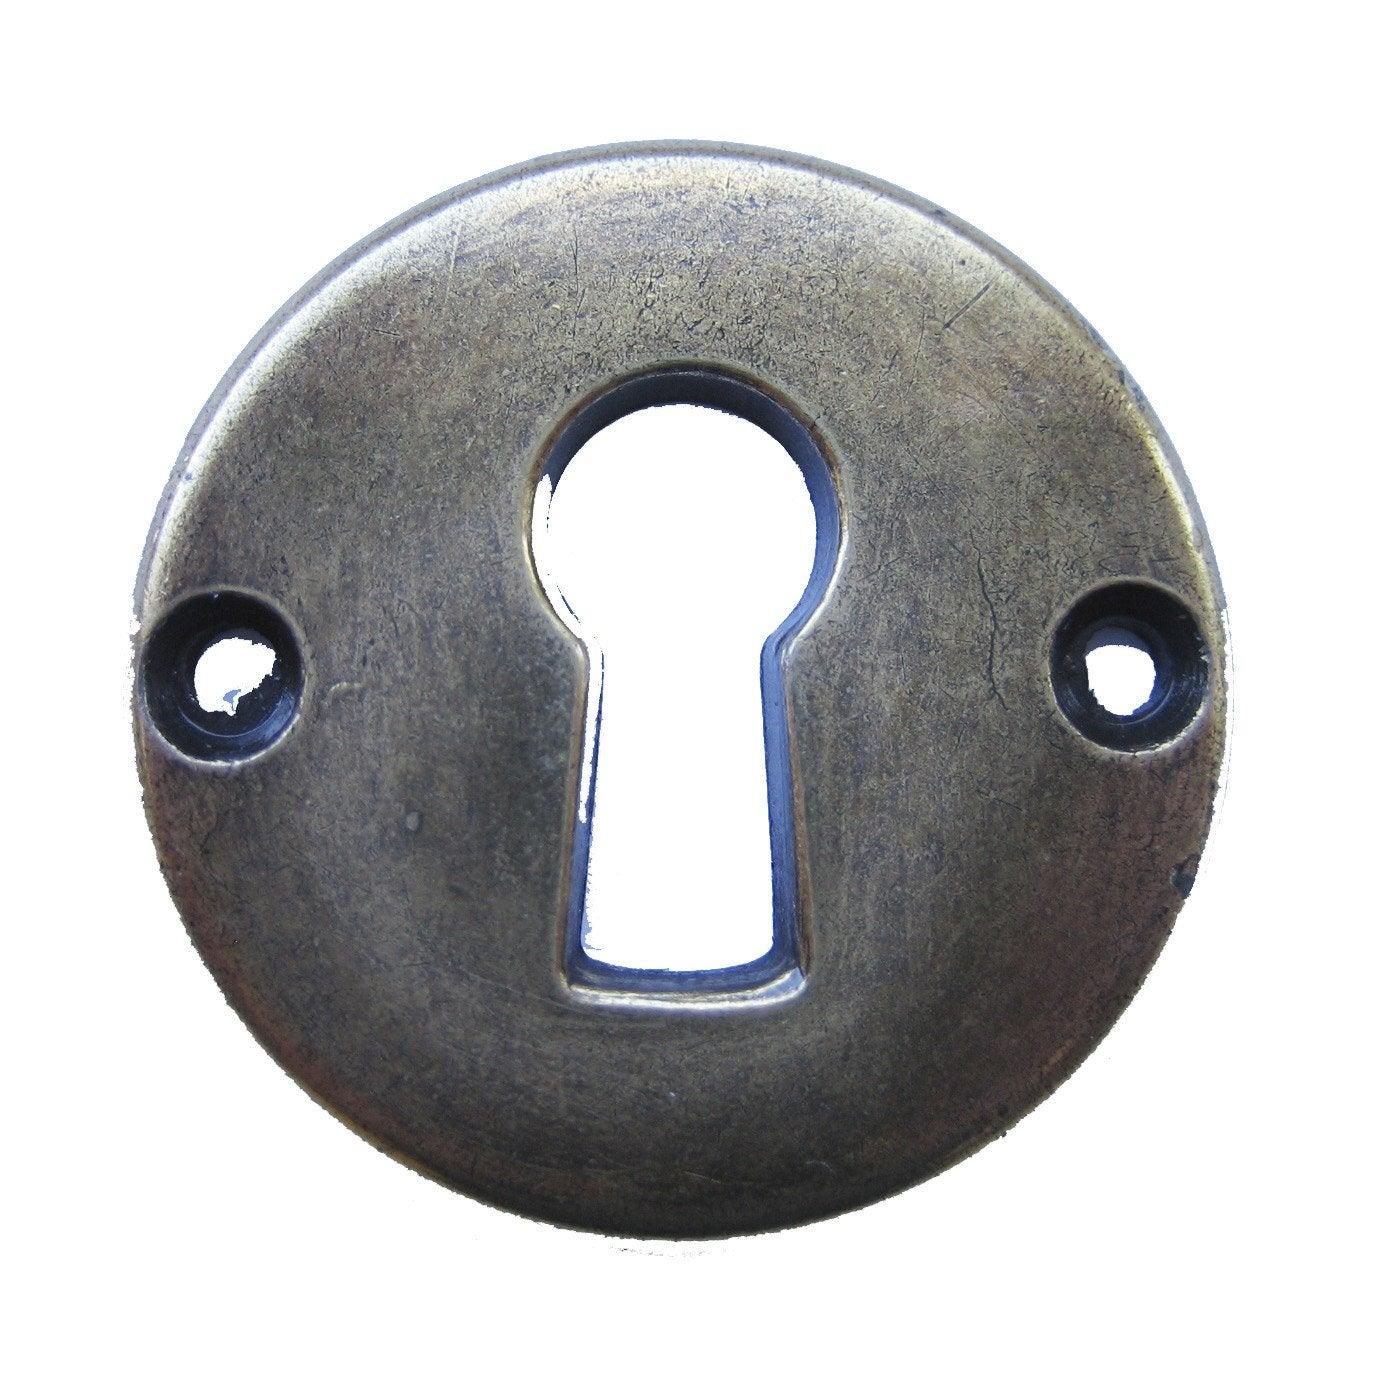 Entr e de serrure de meuble acier en applique hettich - Habillage de porte leroy merlin ...